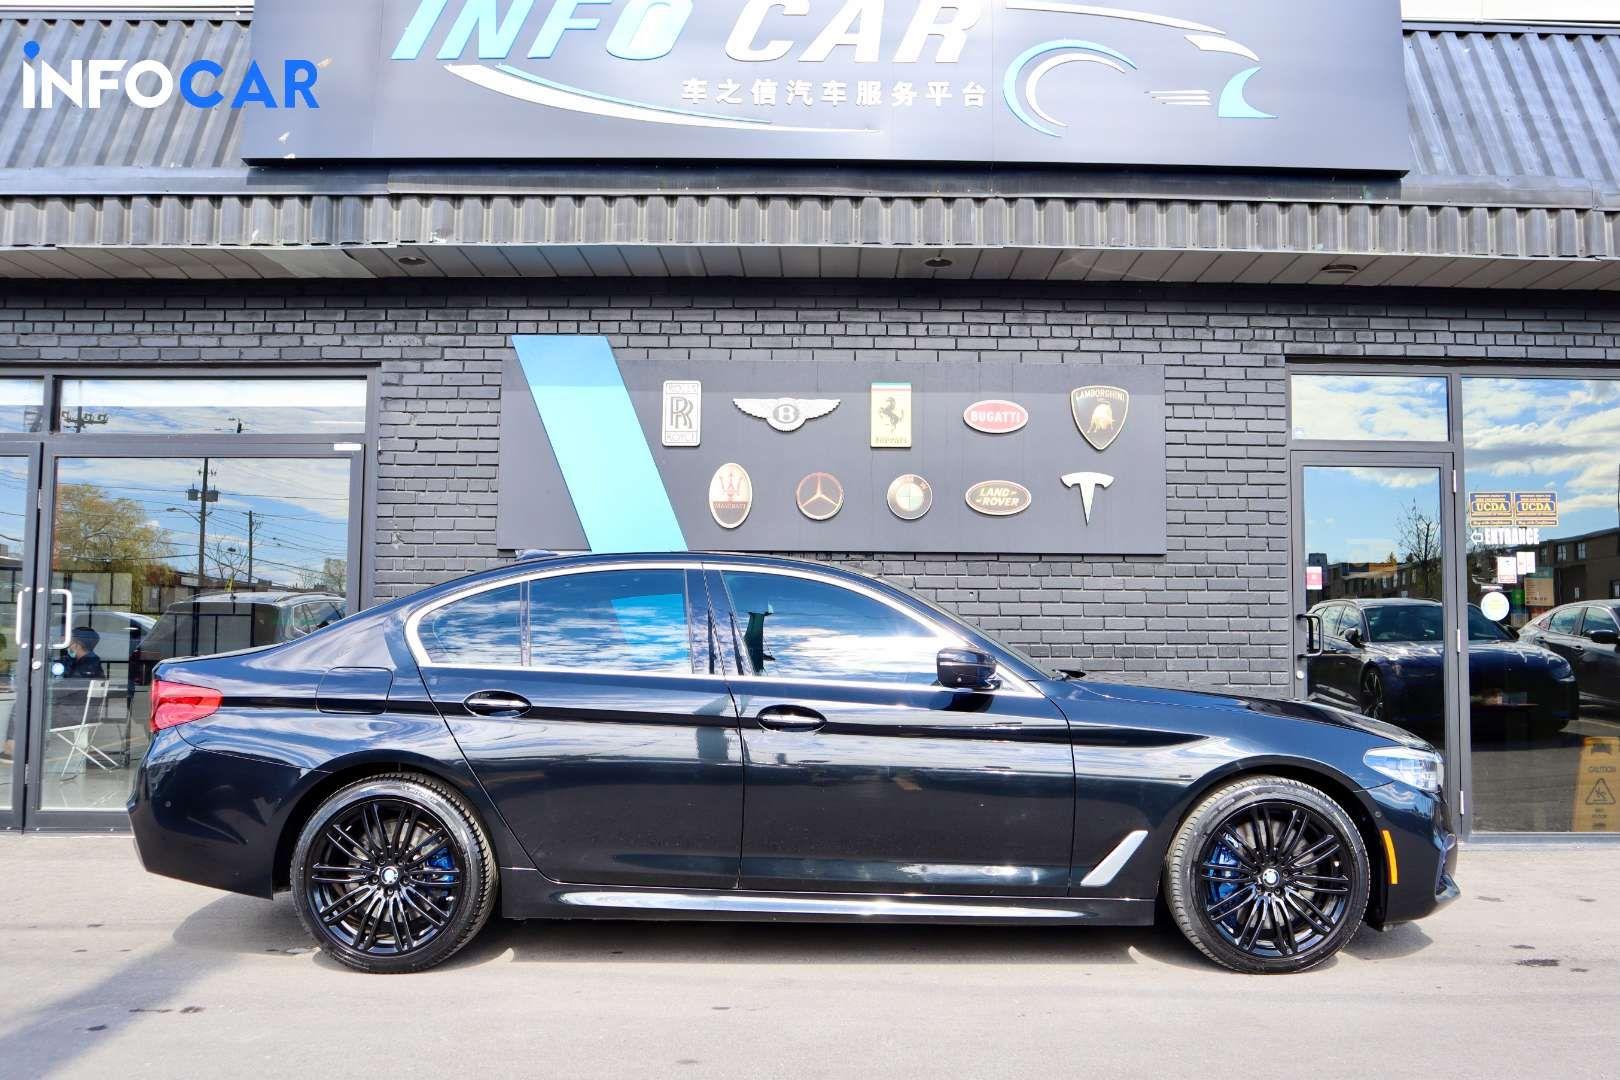 2018 BMW 5-Series 540i xDrive - INFOCAR - Toronto's Most Comprehensive New and Used Auto Trading Platform